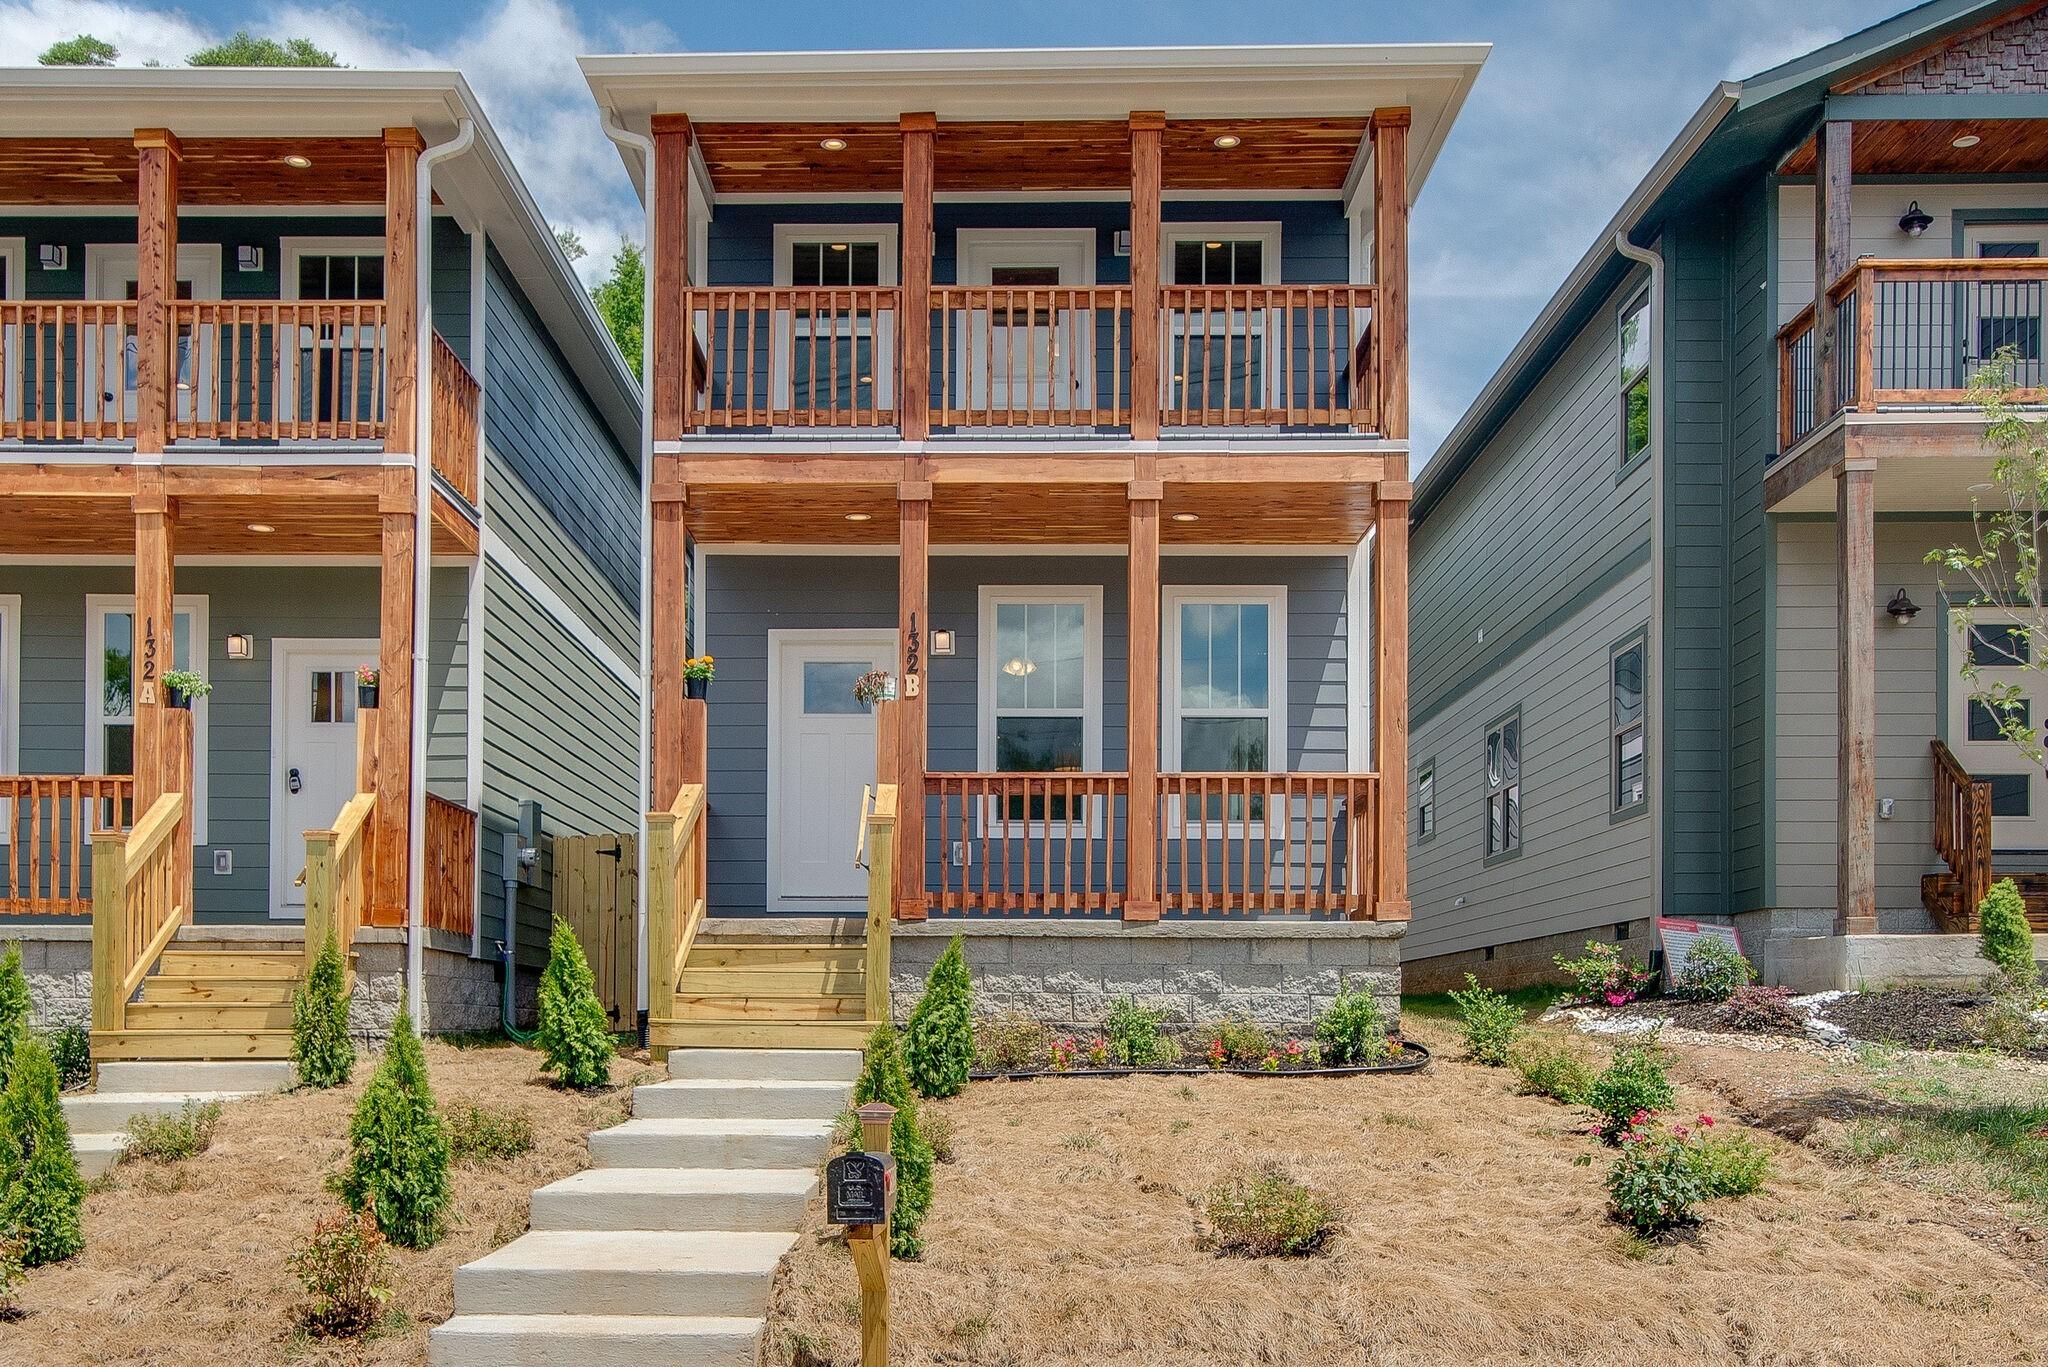 132 Fain St #B Property Photo - Nashville, TN real estate listing